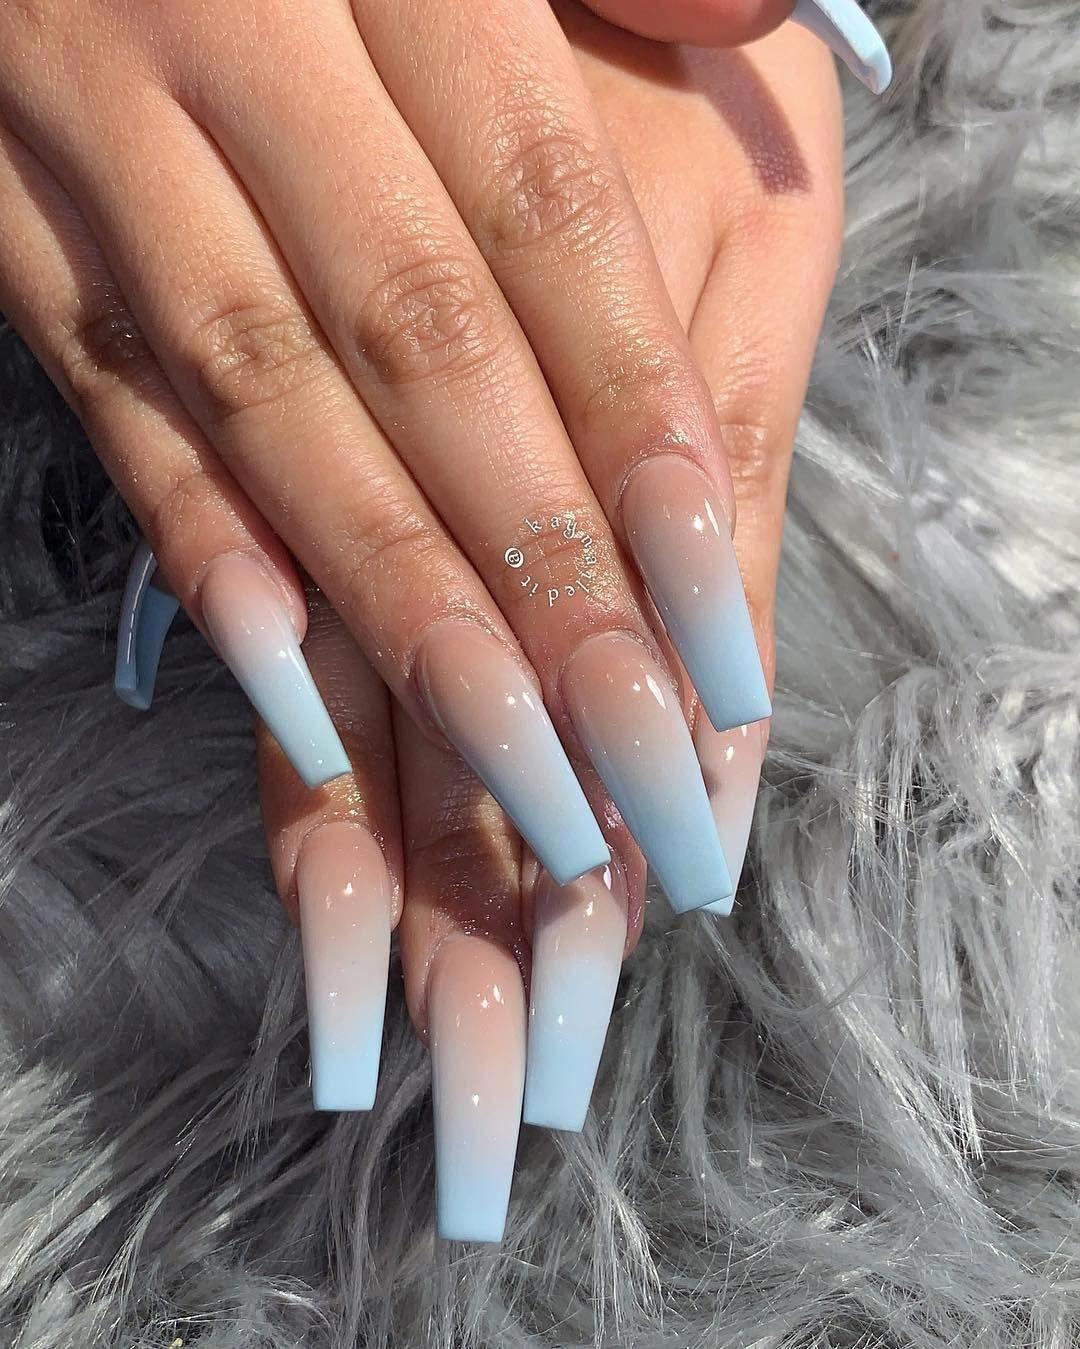 Kayagbayani On Instagram Birthday Set 2 For Today Nailsacrylic Birthdaynails Ombre Acrylic Nails Blue Acrylic Nails Best Acrylic Nails